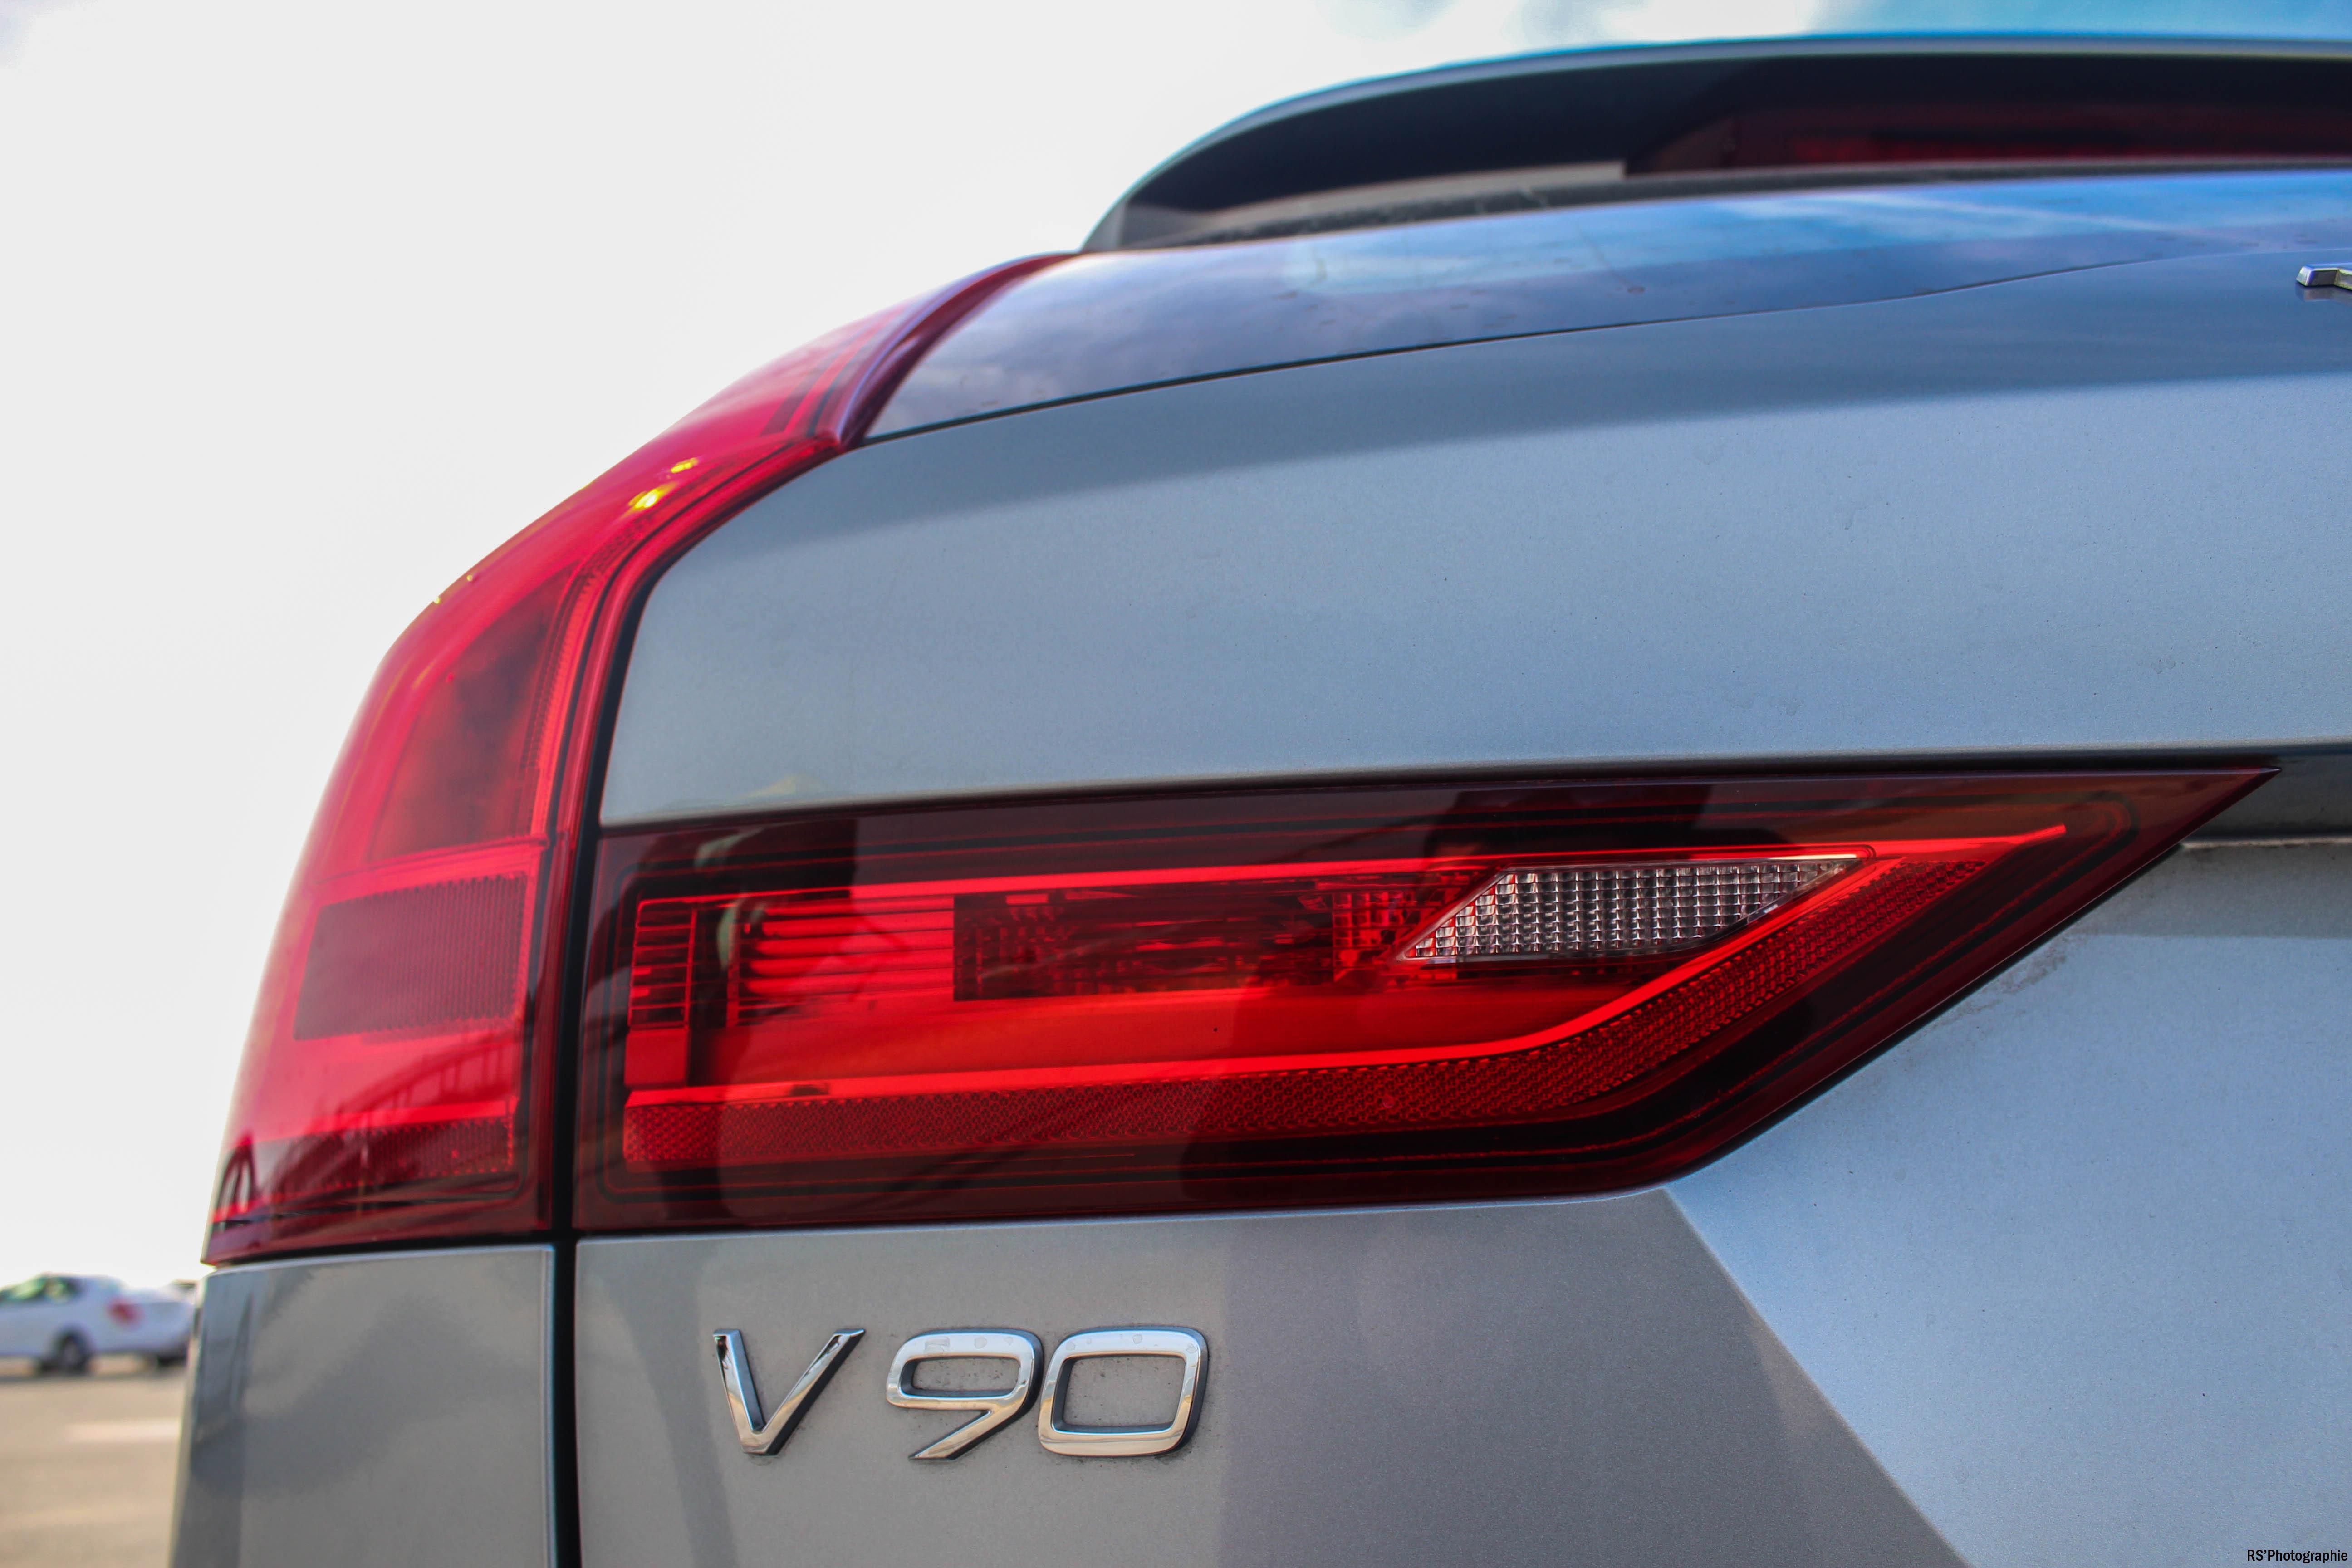 VolvoV9020-volvo-v90-d5-arriere-rear-Arnaud Demasier-RSPhotographie